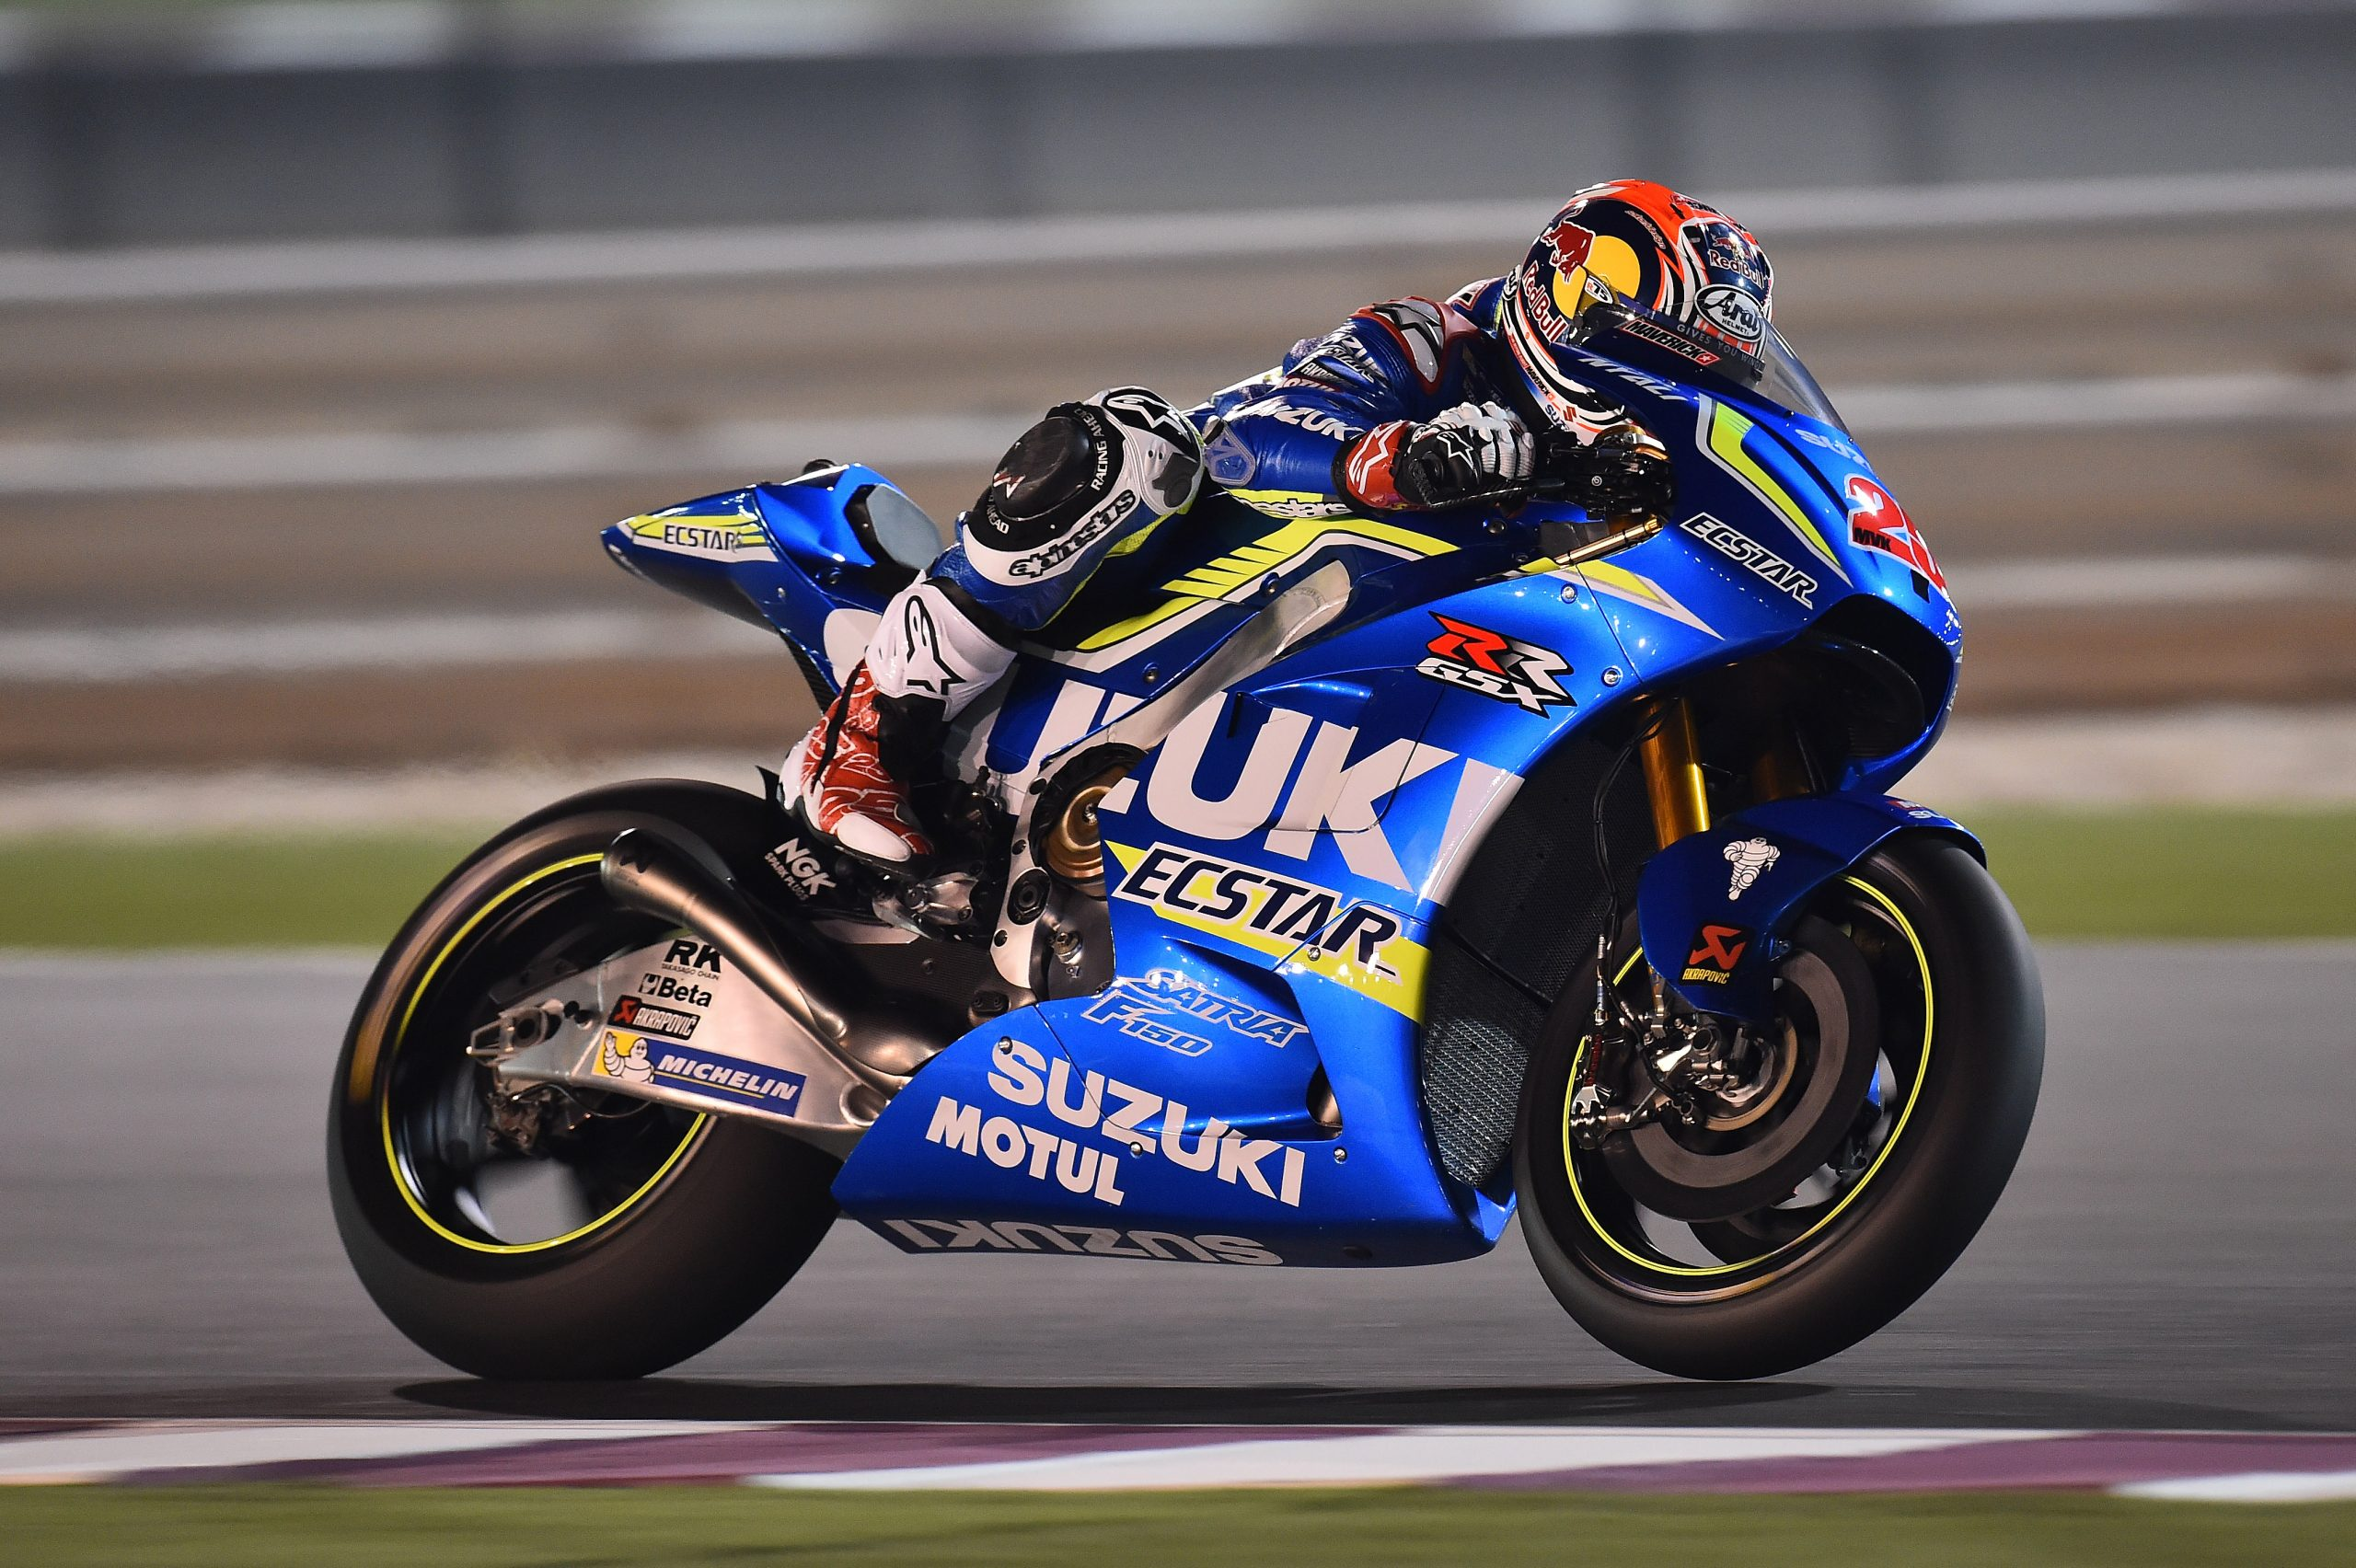 2016 Motogp Season Qatar Michelin